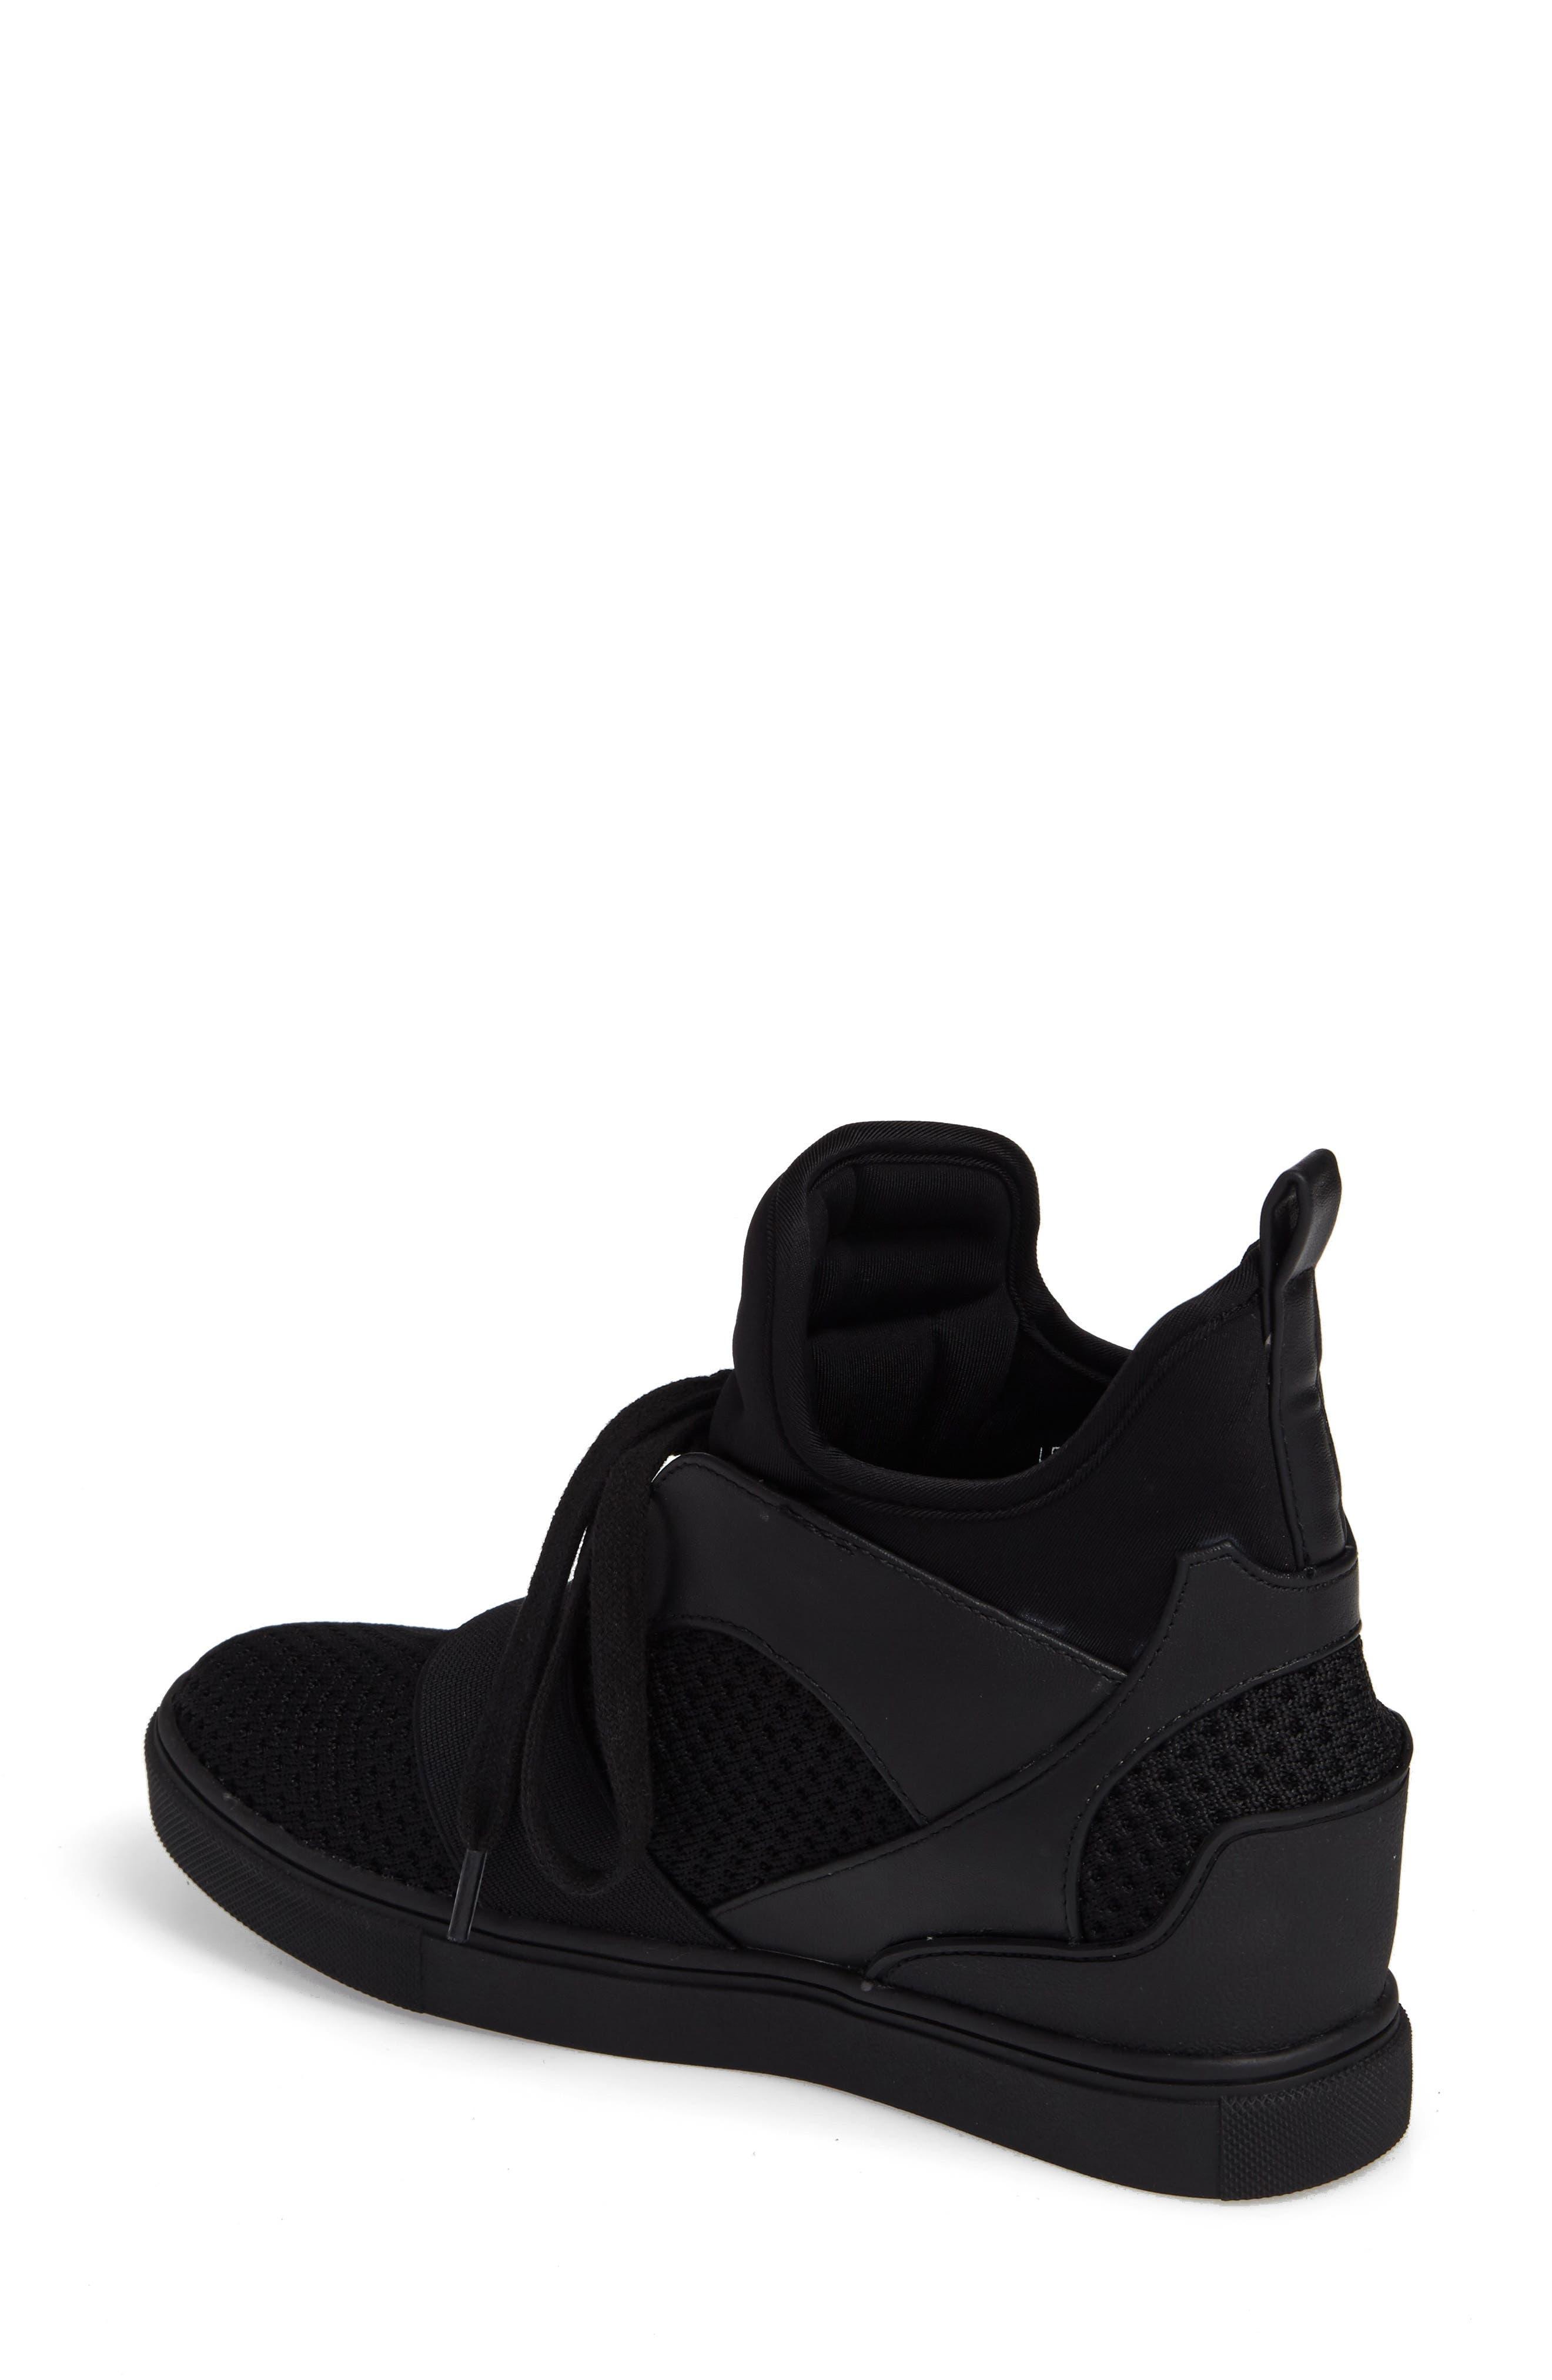 Lexie Wedge Sneaker,                             Alternate thumbnail 2, color,                             001